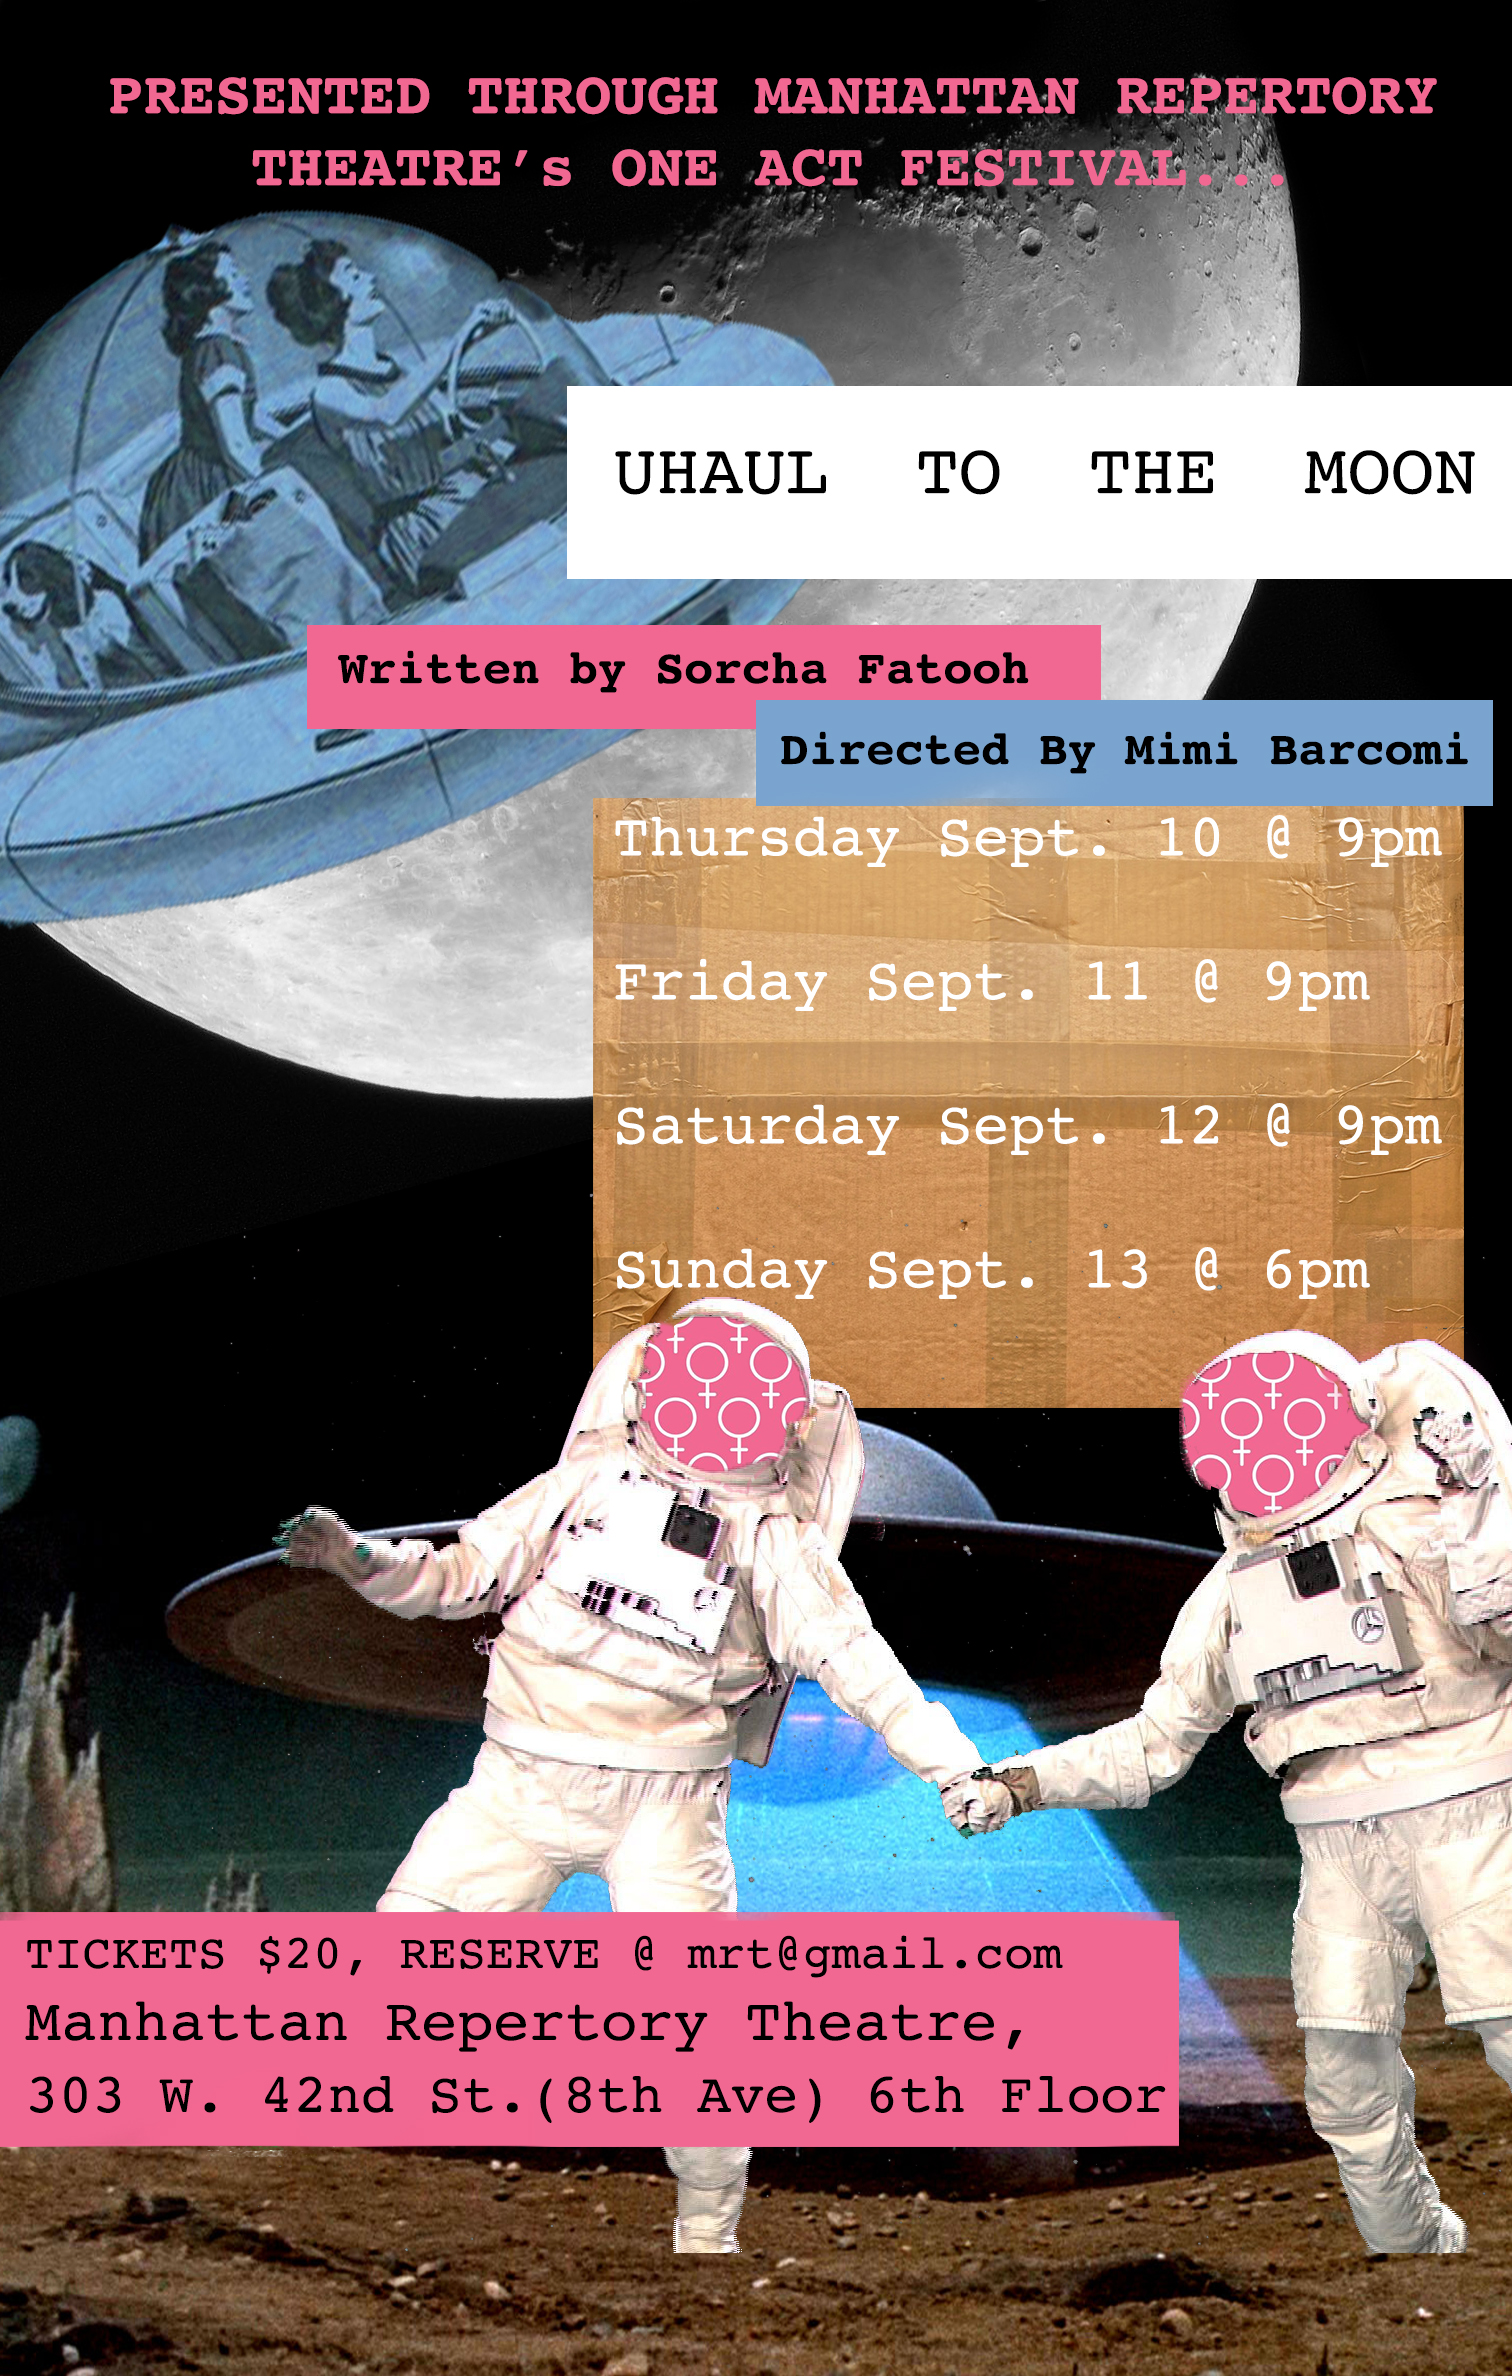 Lang Alum Mimi Barcomi's Play Premieres at Manhattan Repertory Theatre